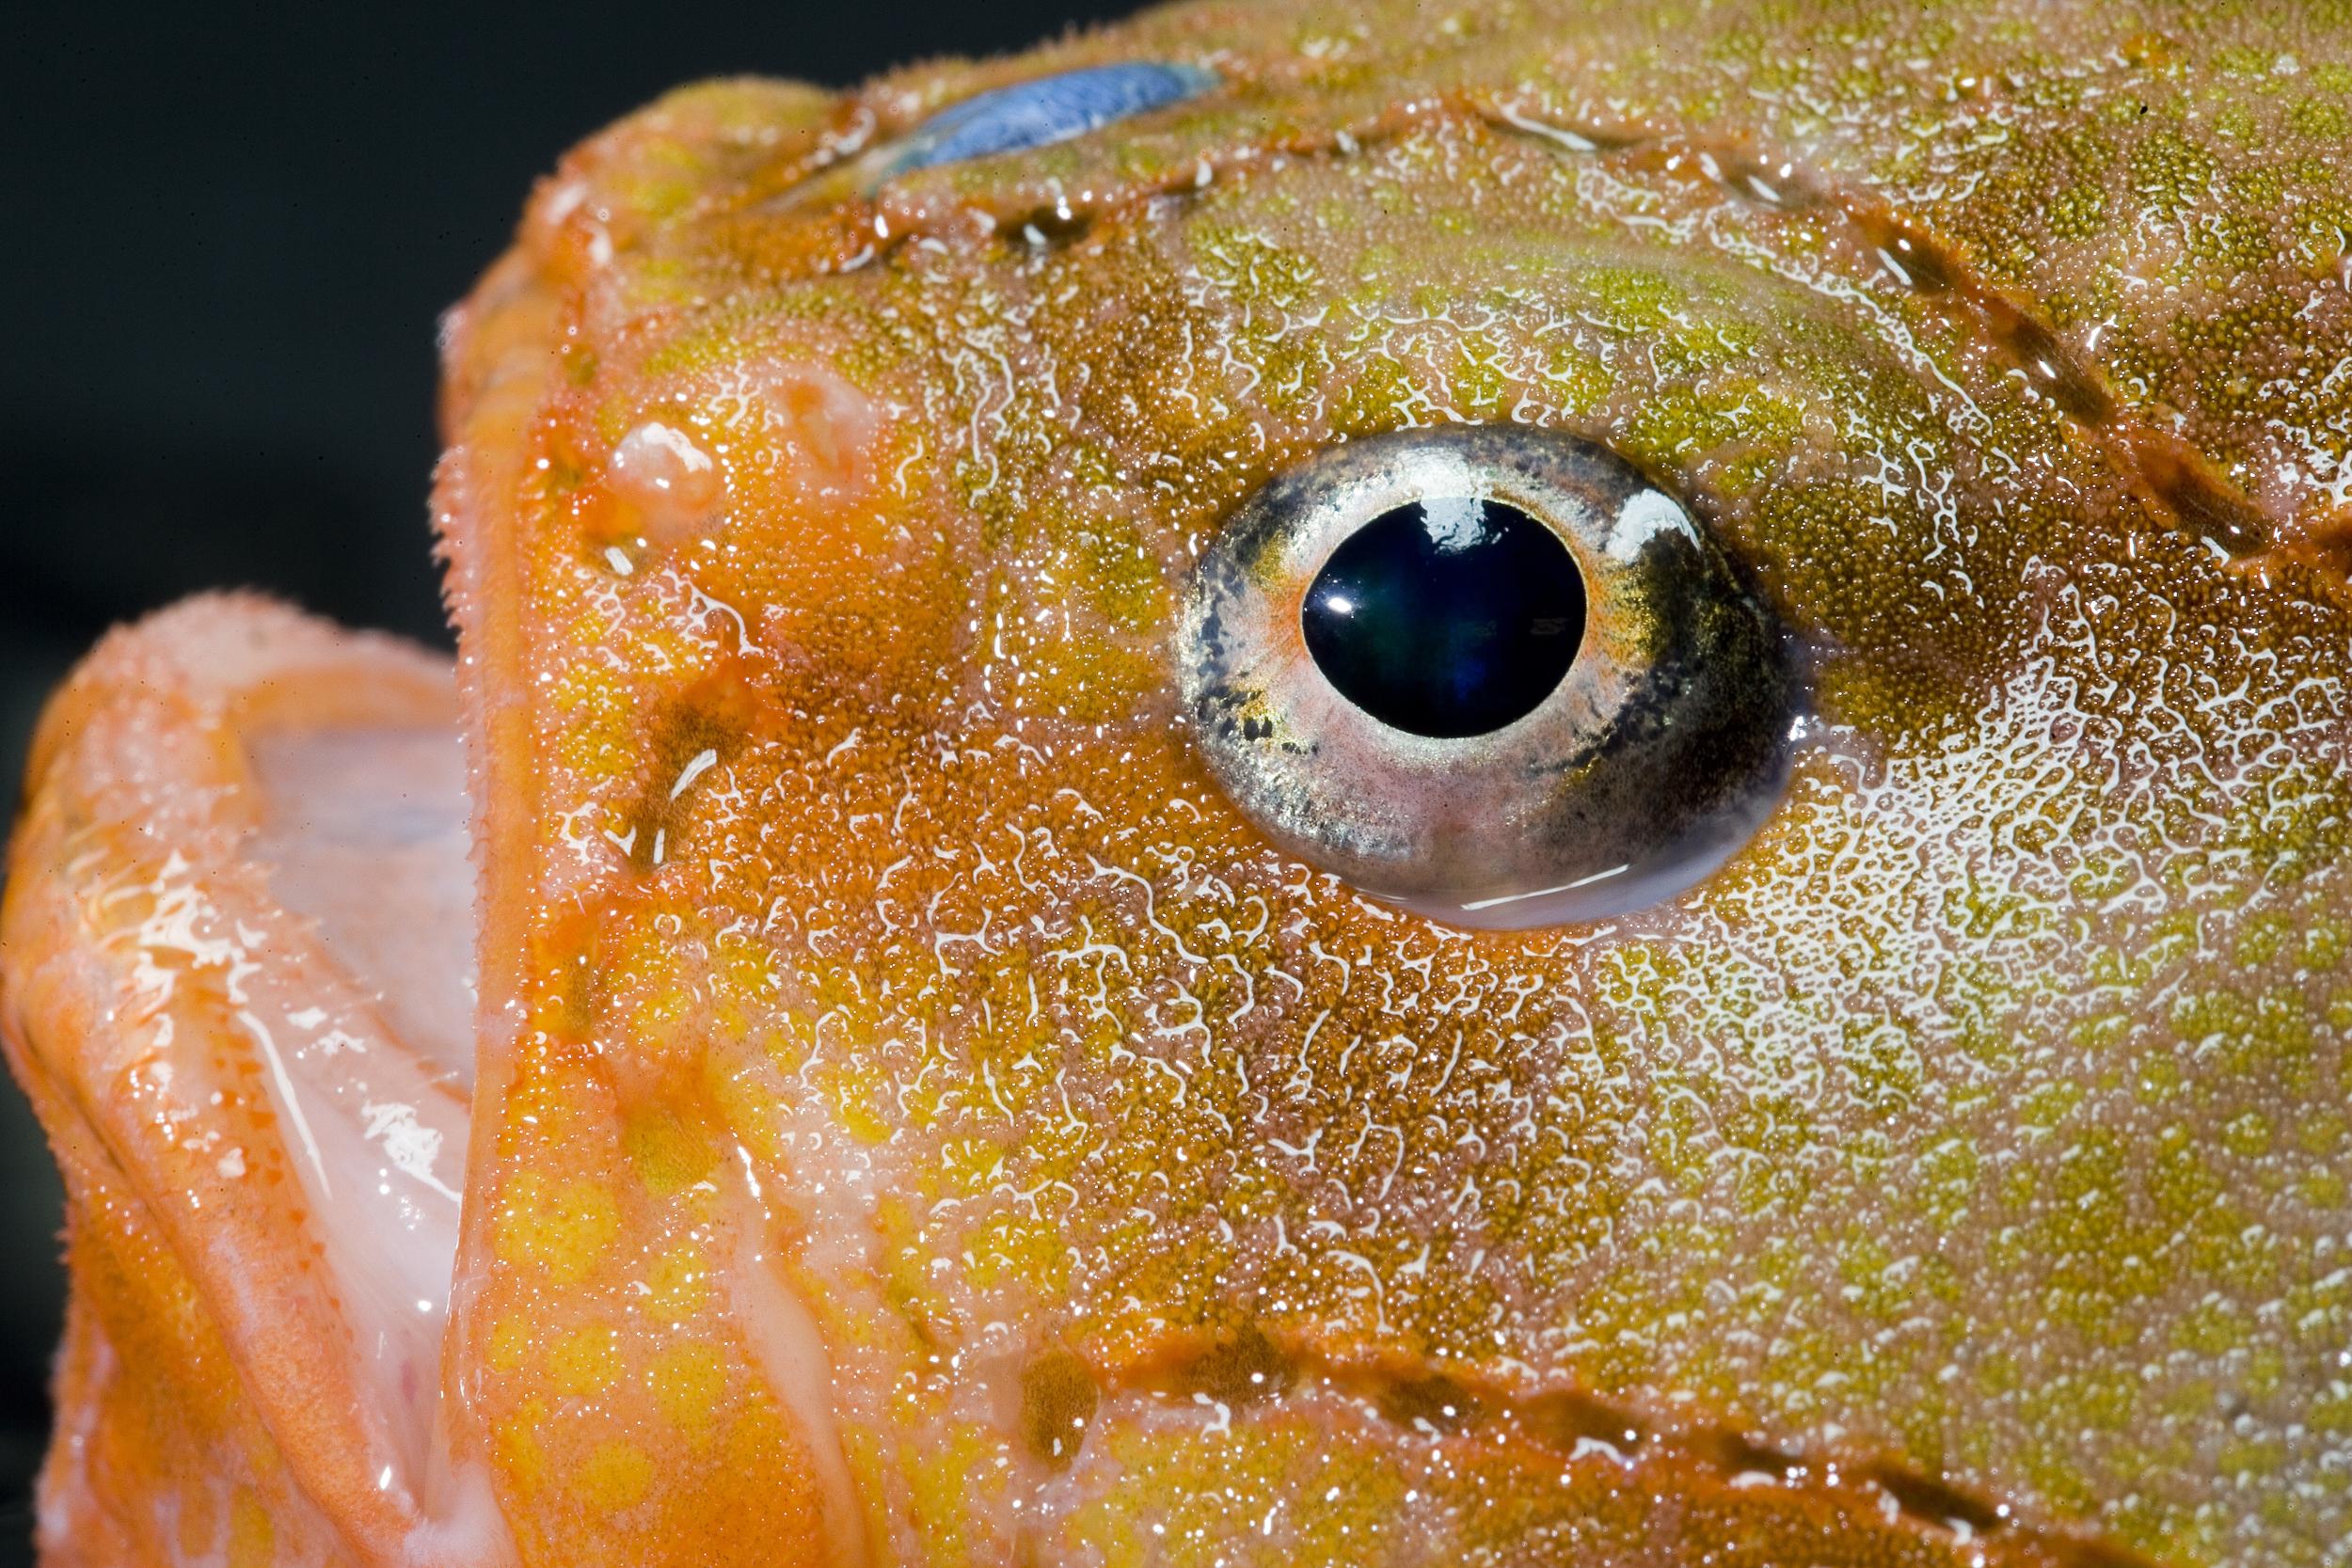 File:Chaunax stigmaeus eye.jpg.